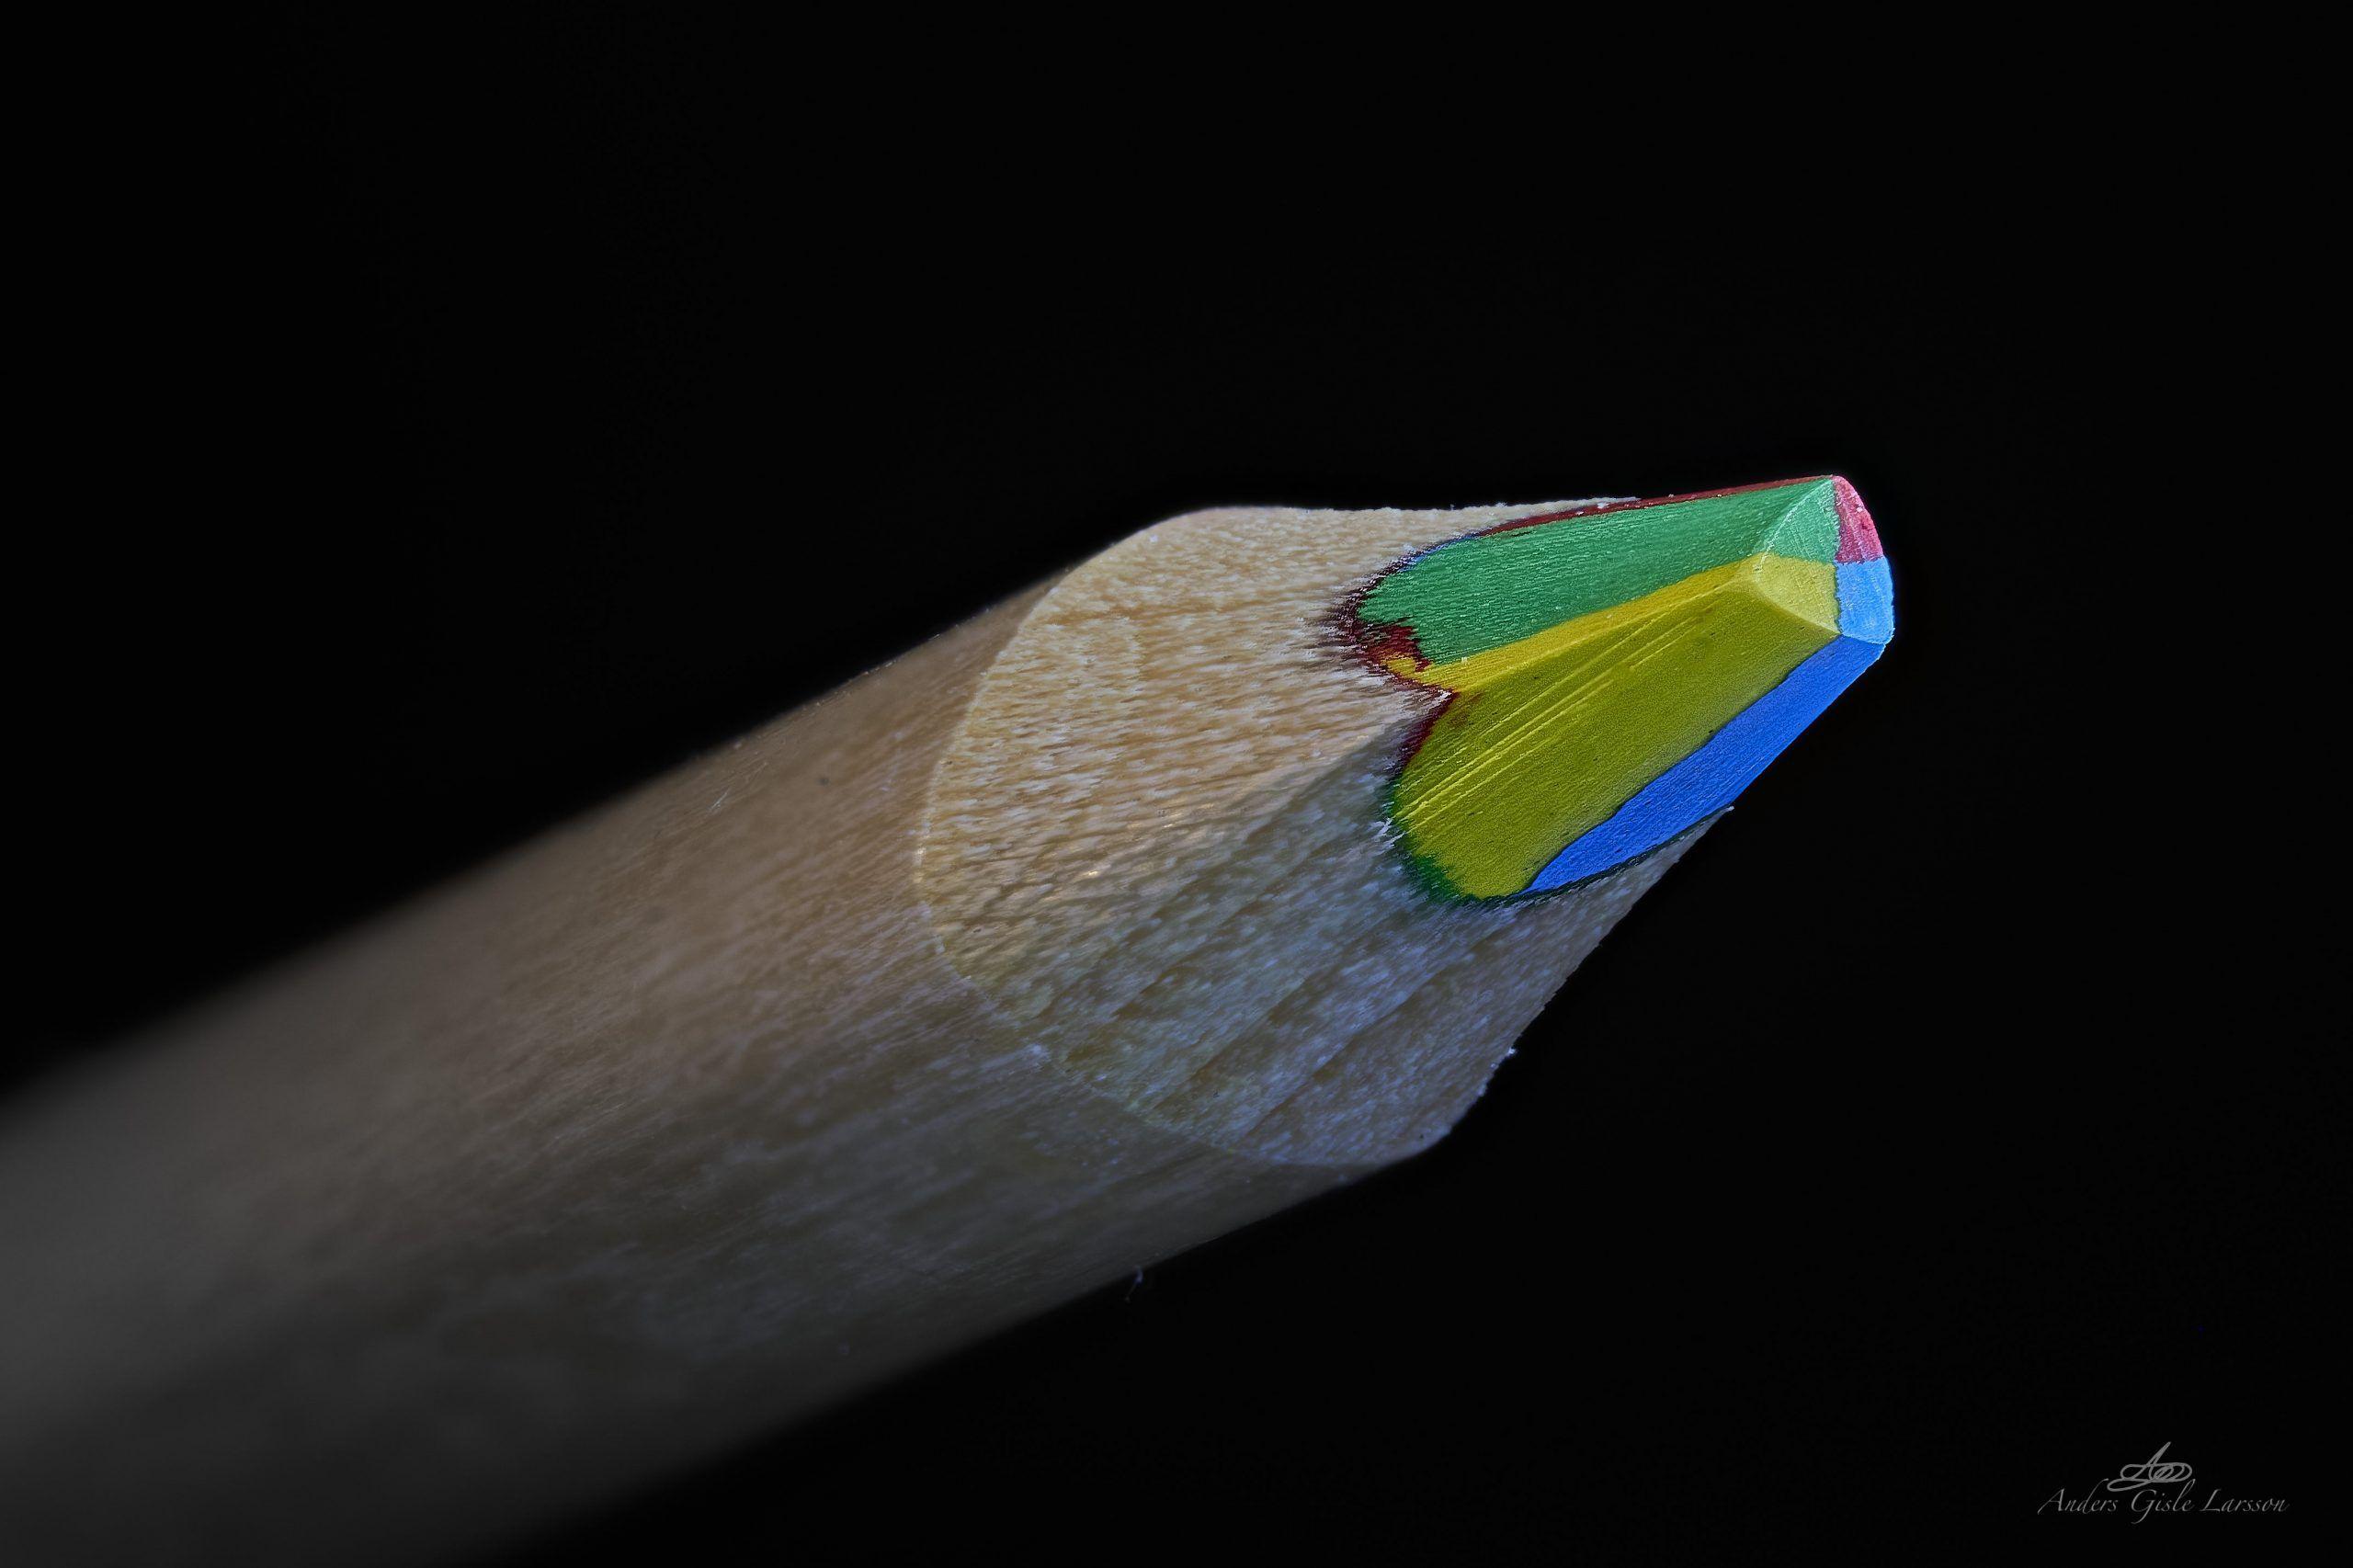 Multicolor, 252/365, Uge 36, Assentoft, Randers